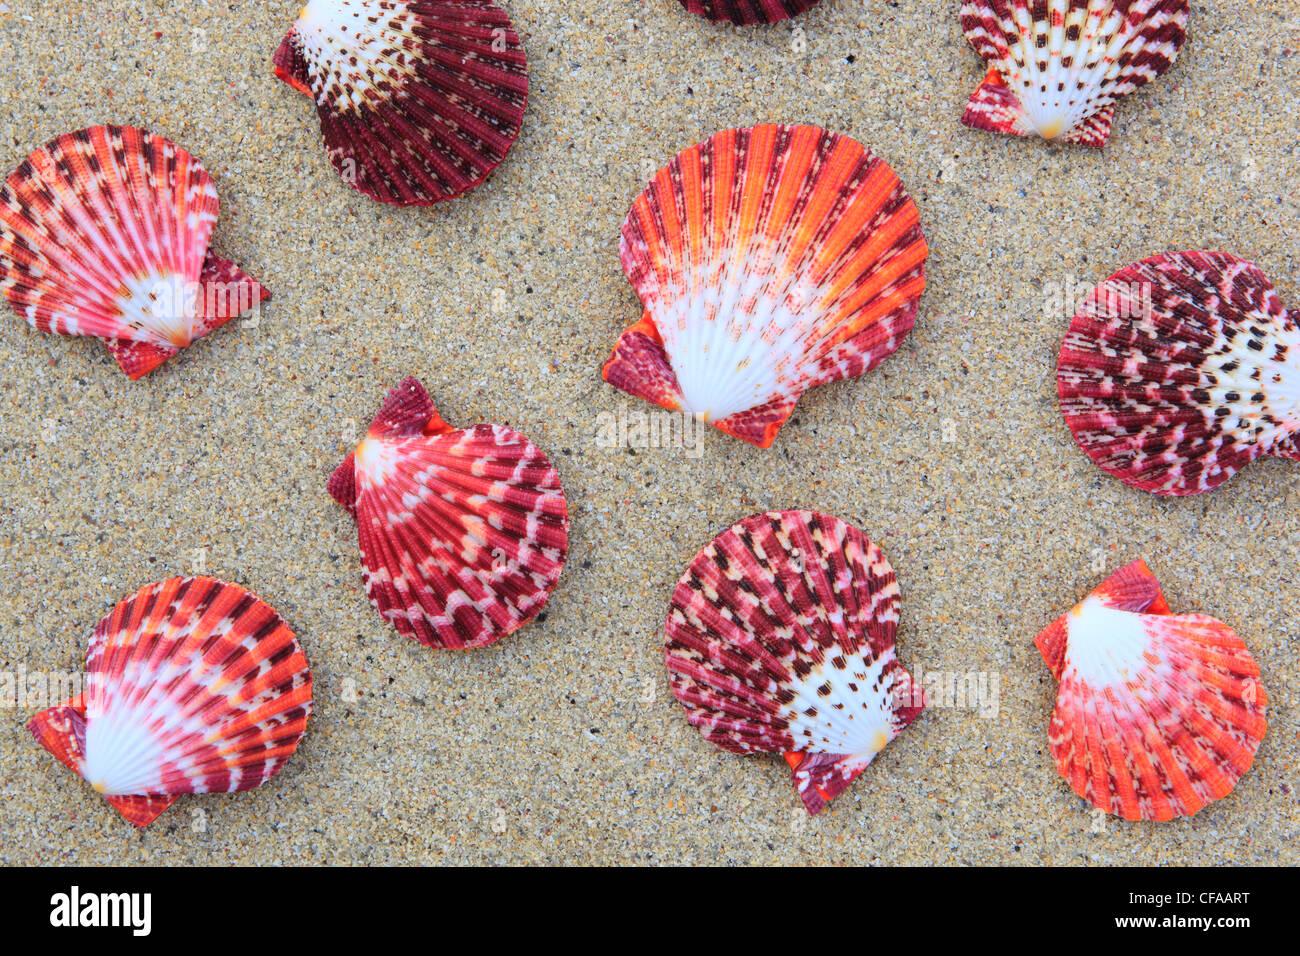 Great Britain, coast, sea, marine animal, mussels, mollusc, nature, North Sea, Pecten pallium, sand, sand beach, - Stock Image